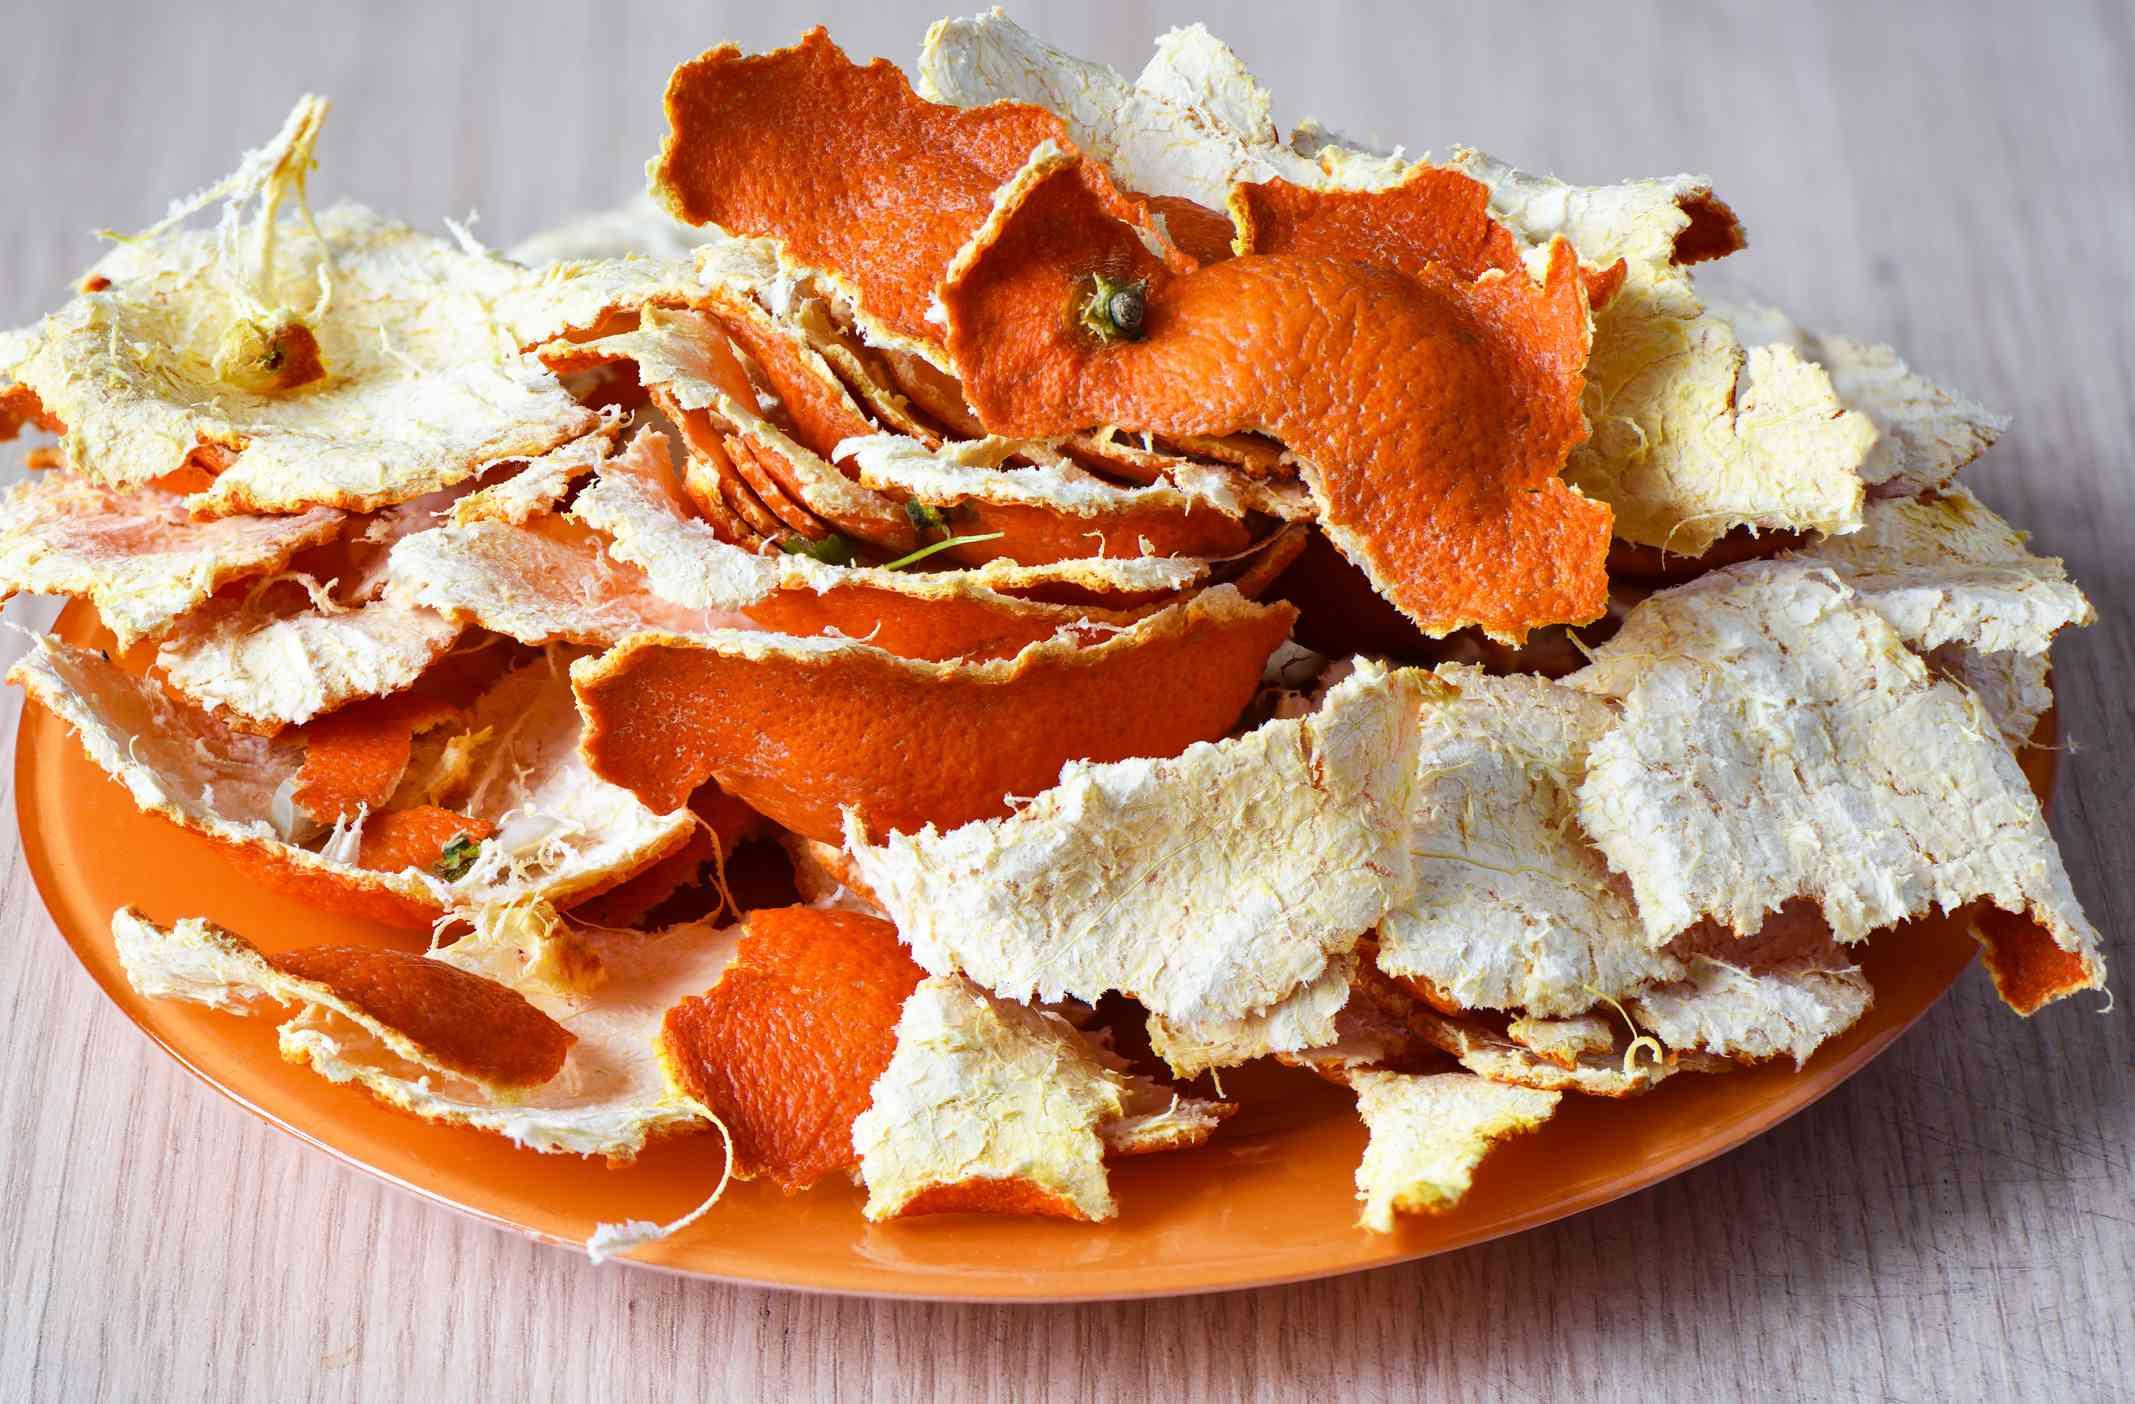 Dried tangerine peel on an orange plate.